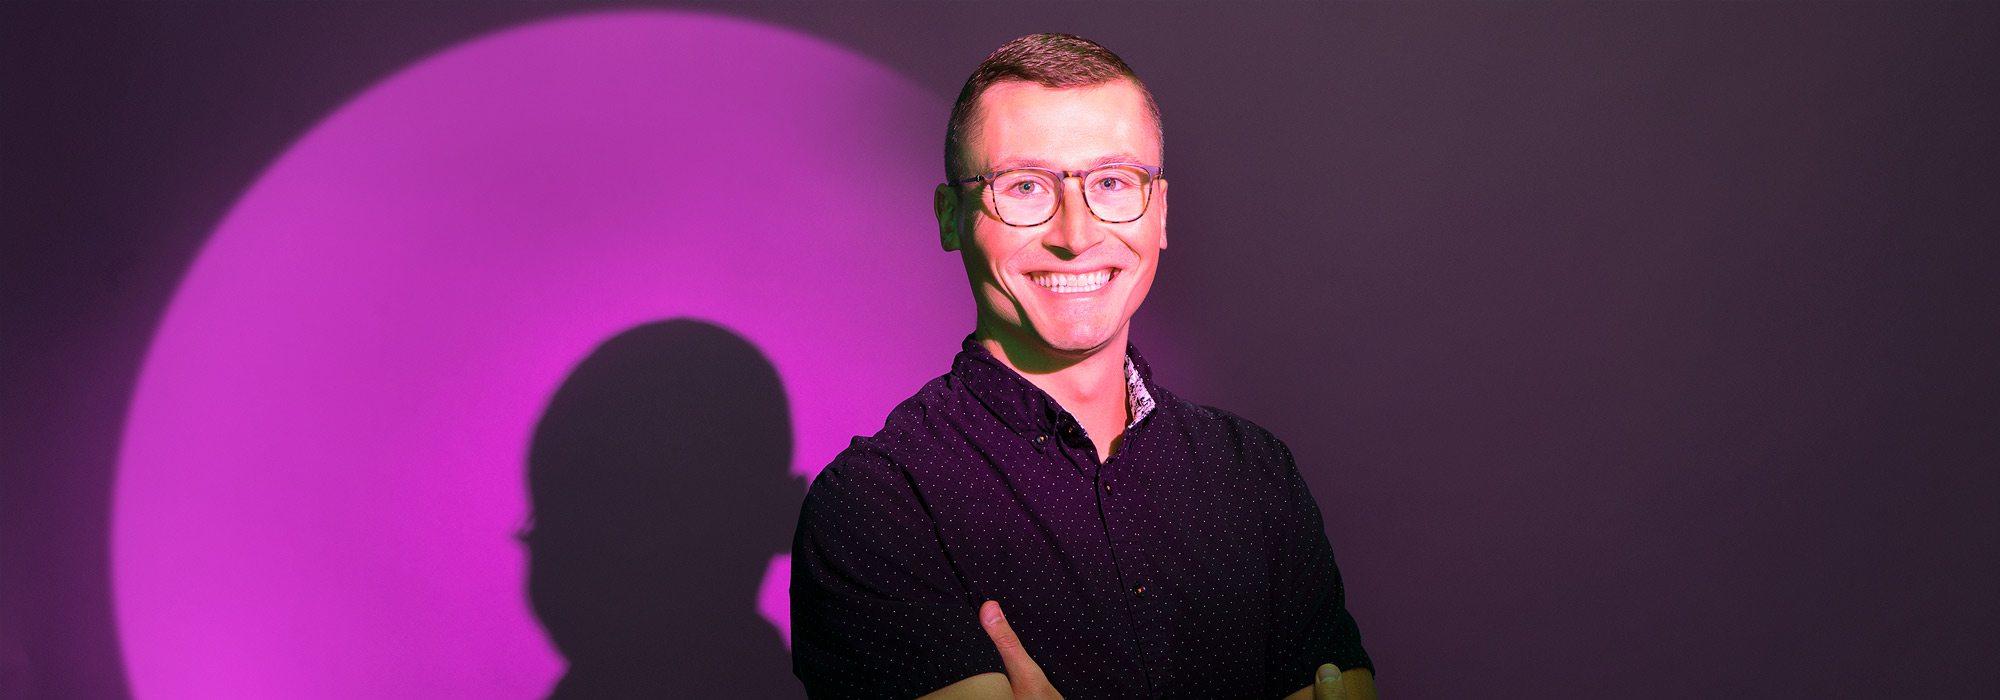 Mitch Jenkins, owner of Elevation Development Co.